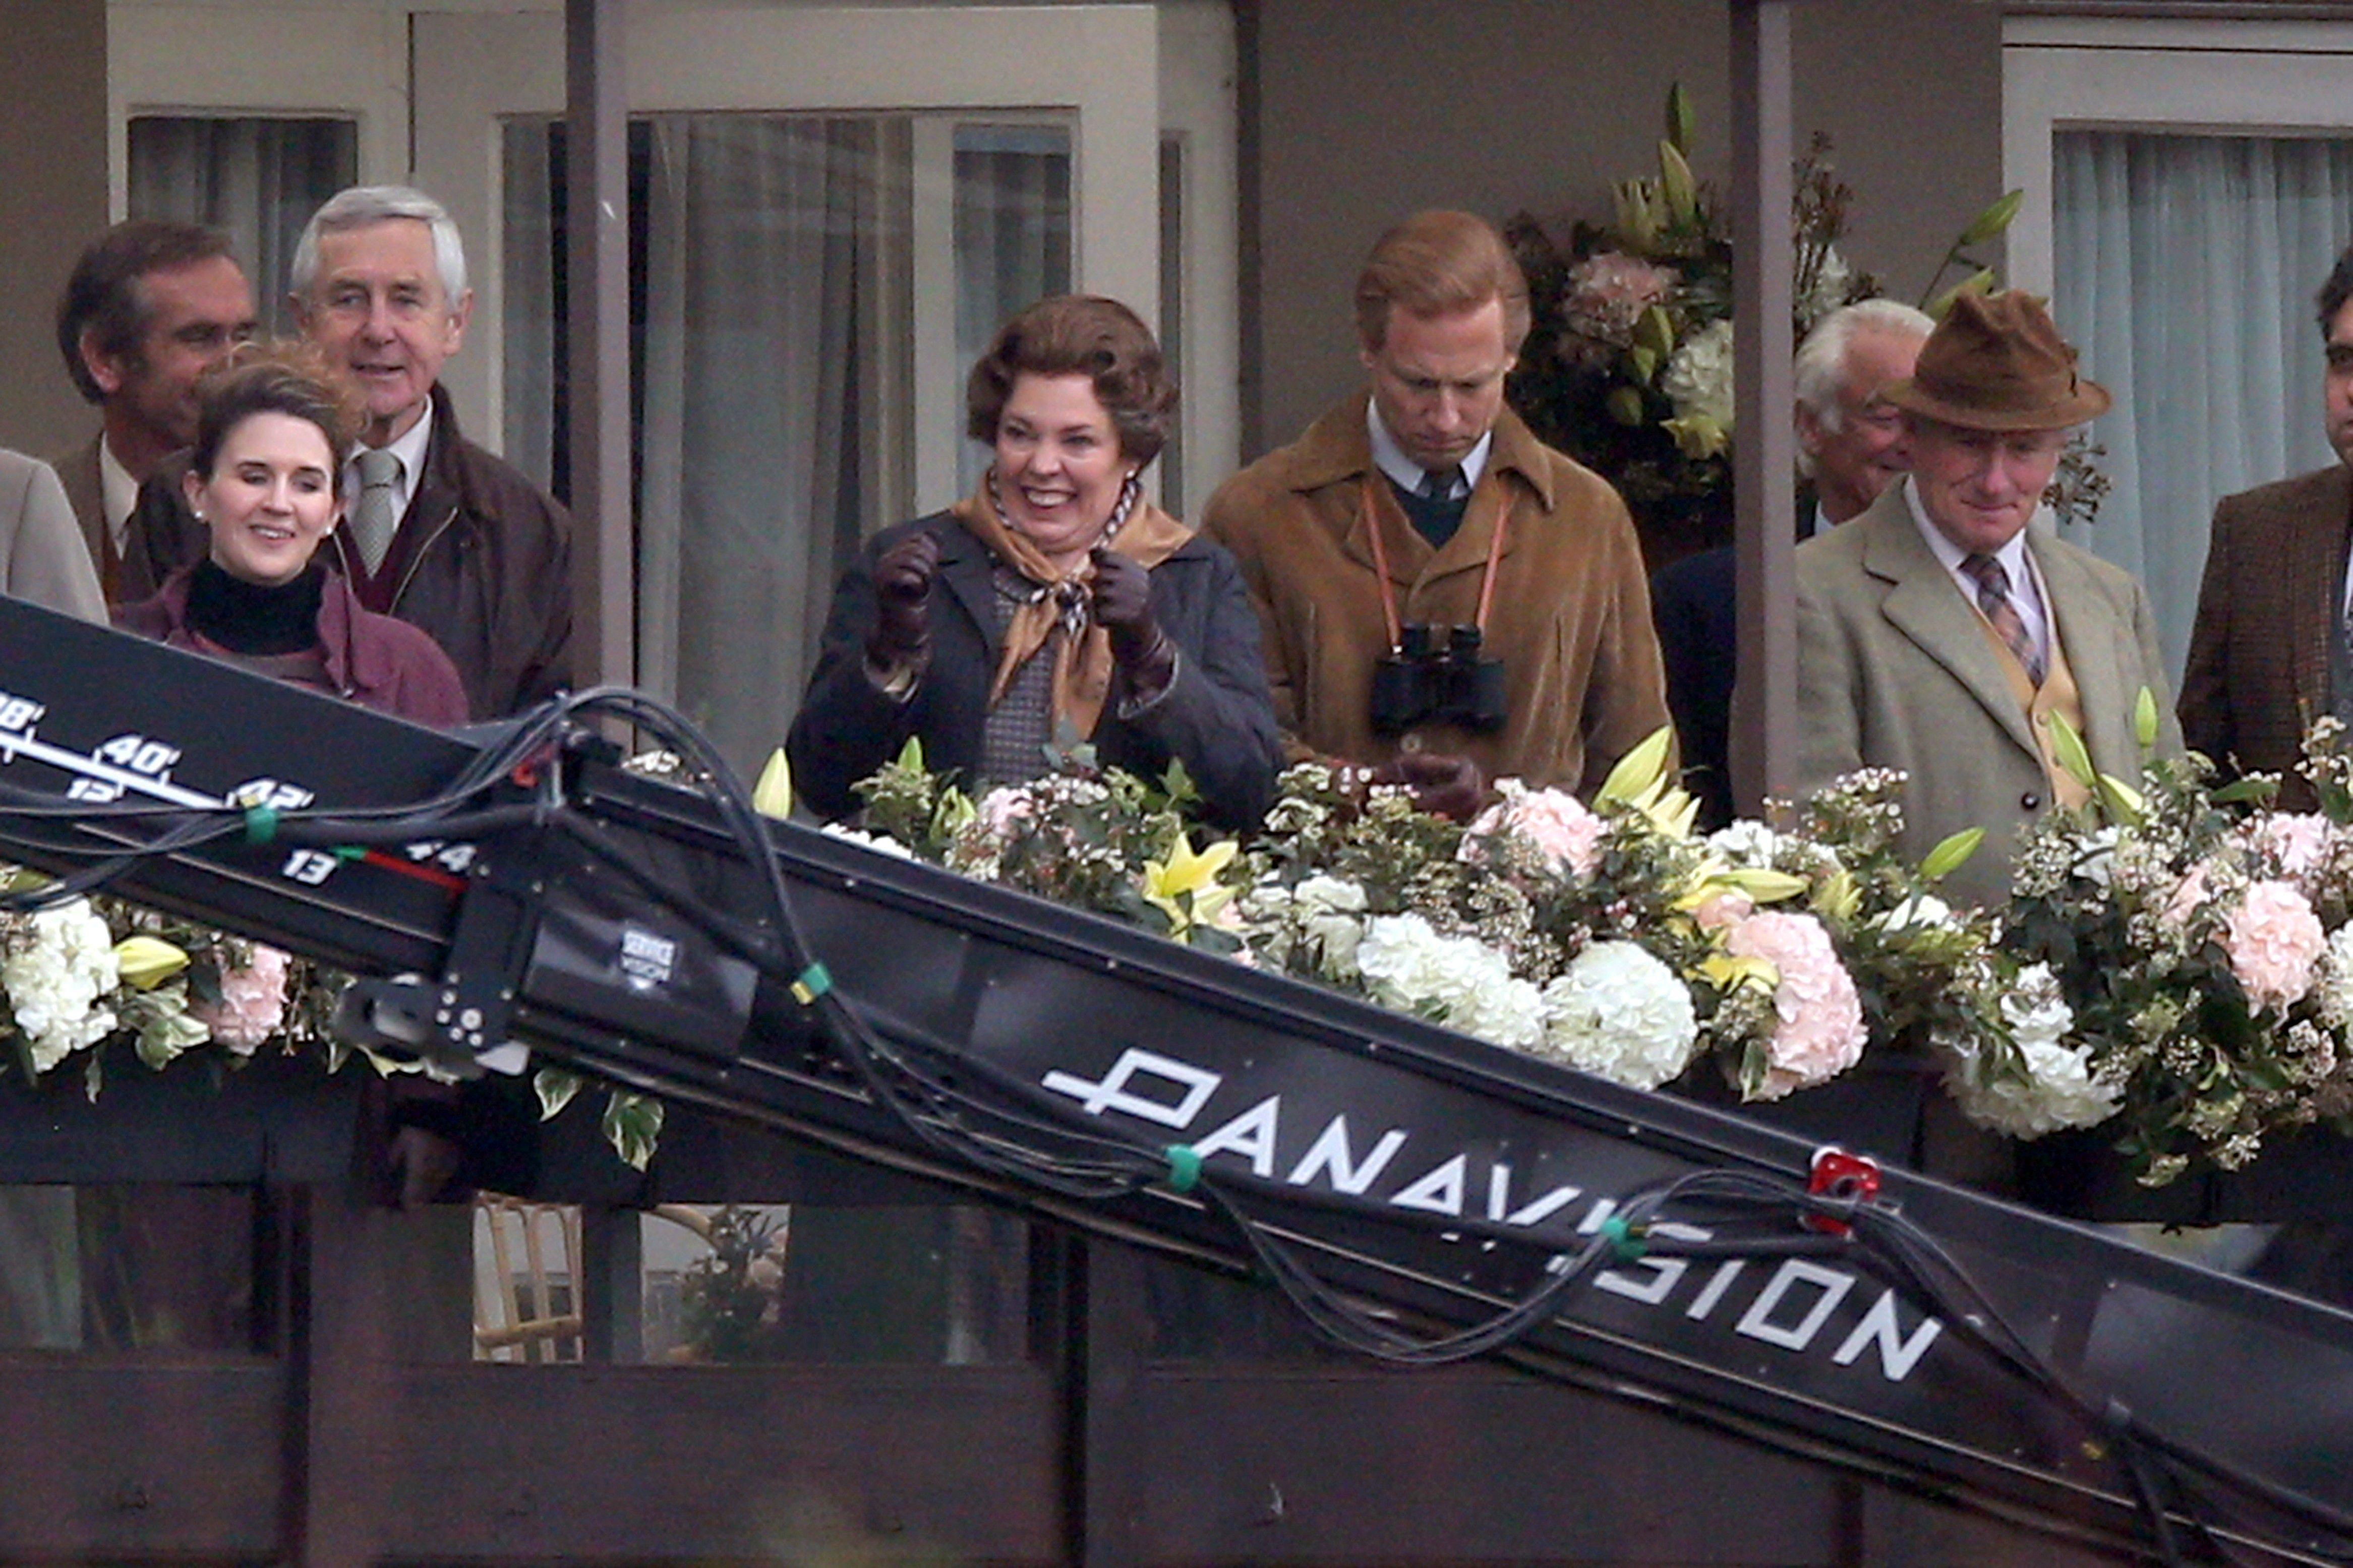 Olivia Colman Looks Ecstatic on the Set of The Crown Season 4